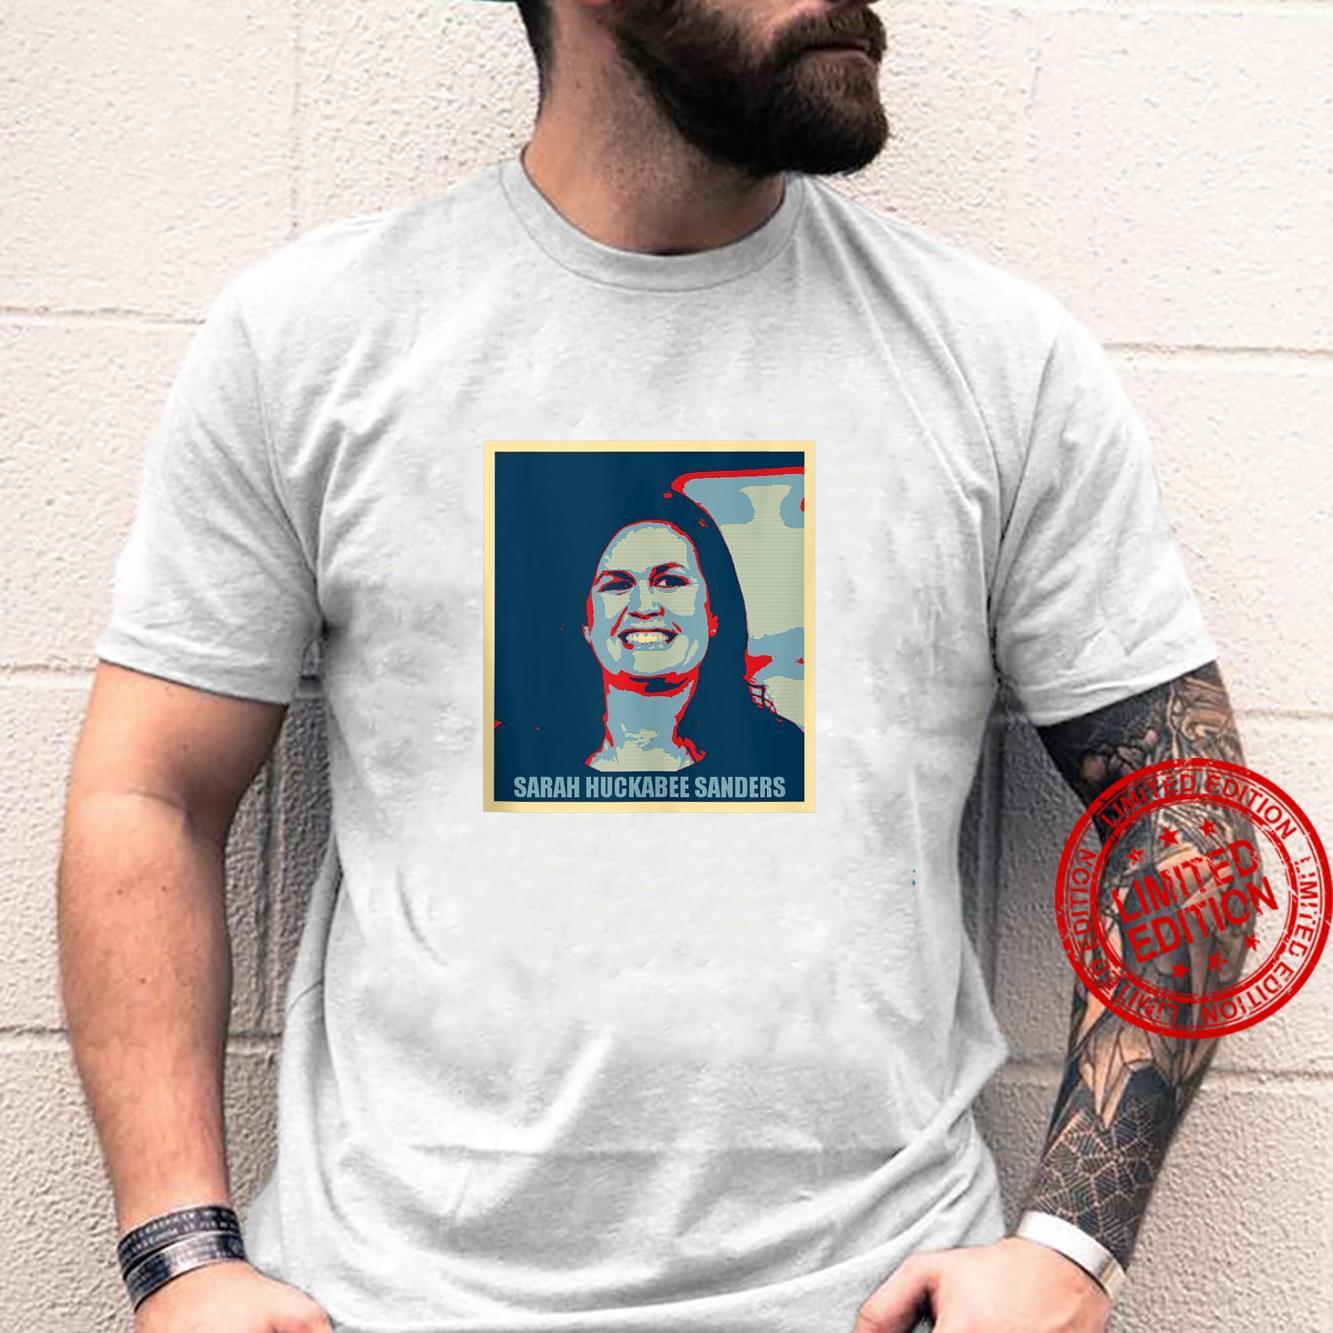 Sarah Huckabee Sanders For Governor Shirt